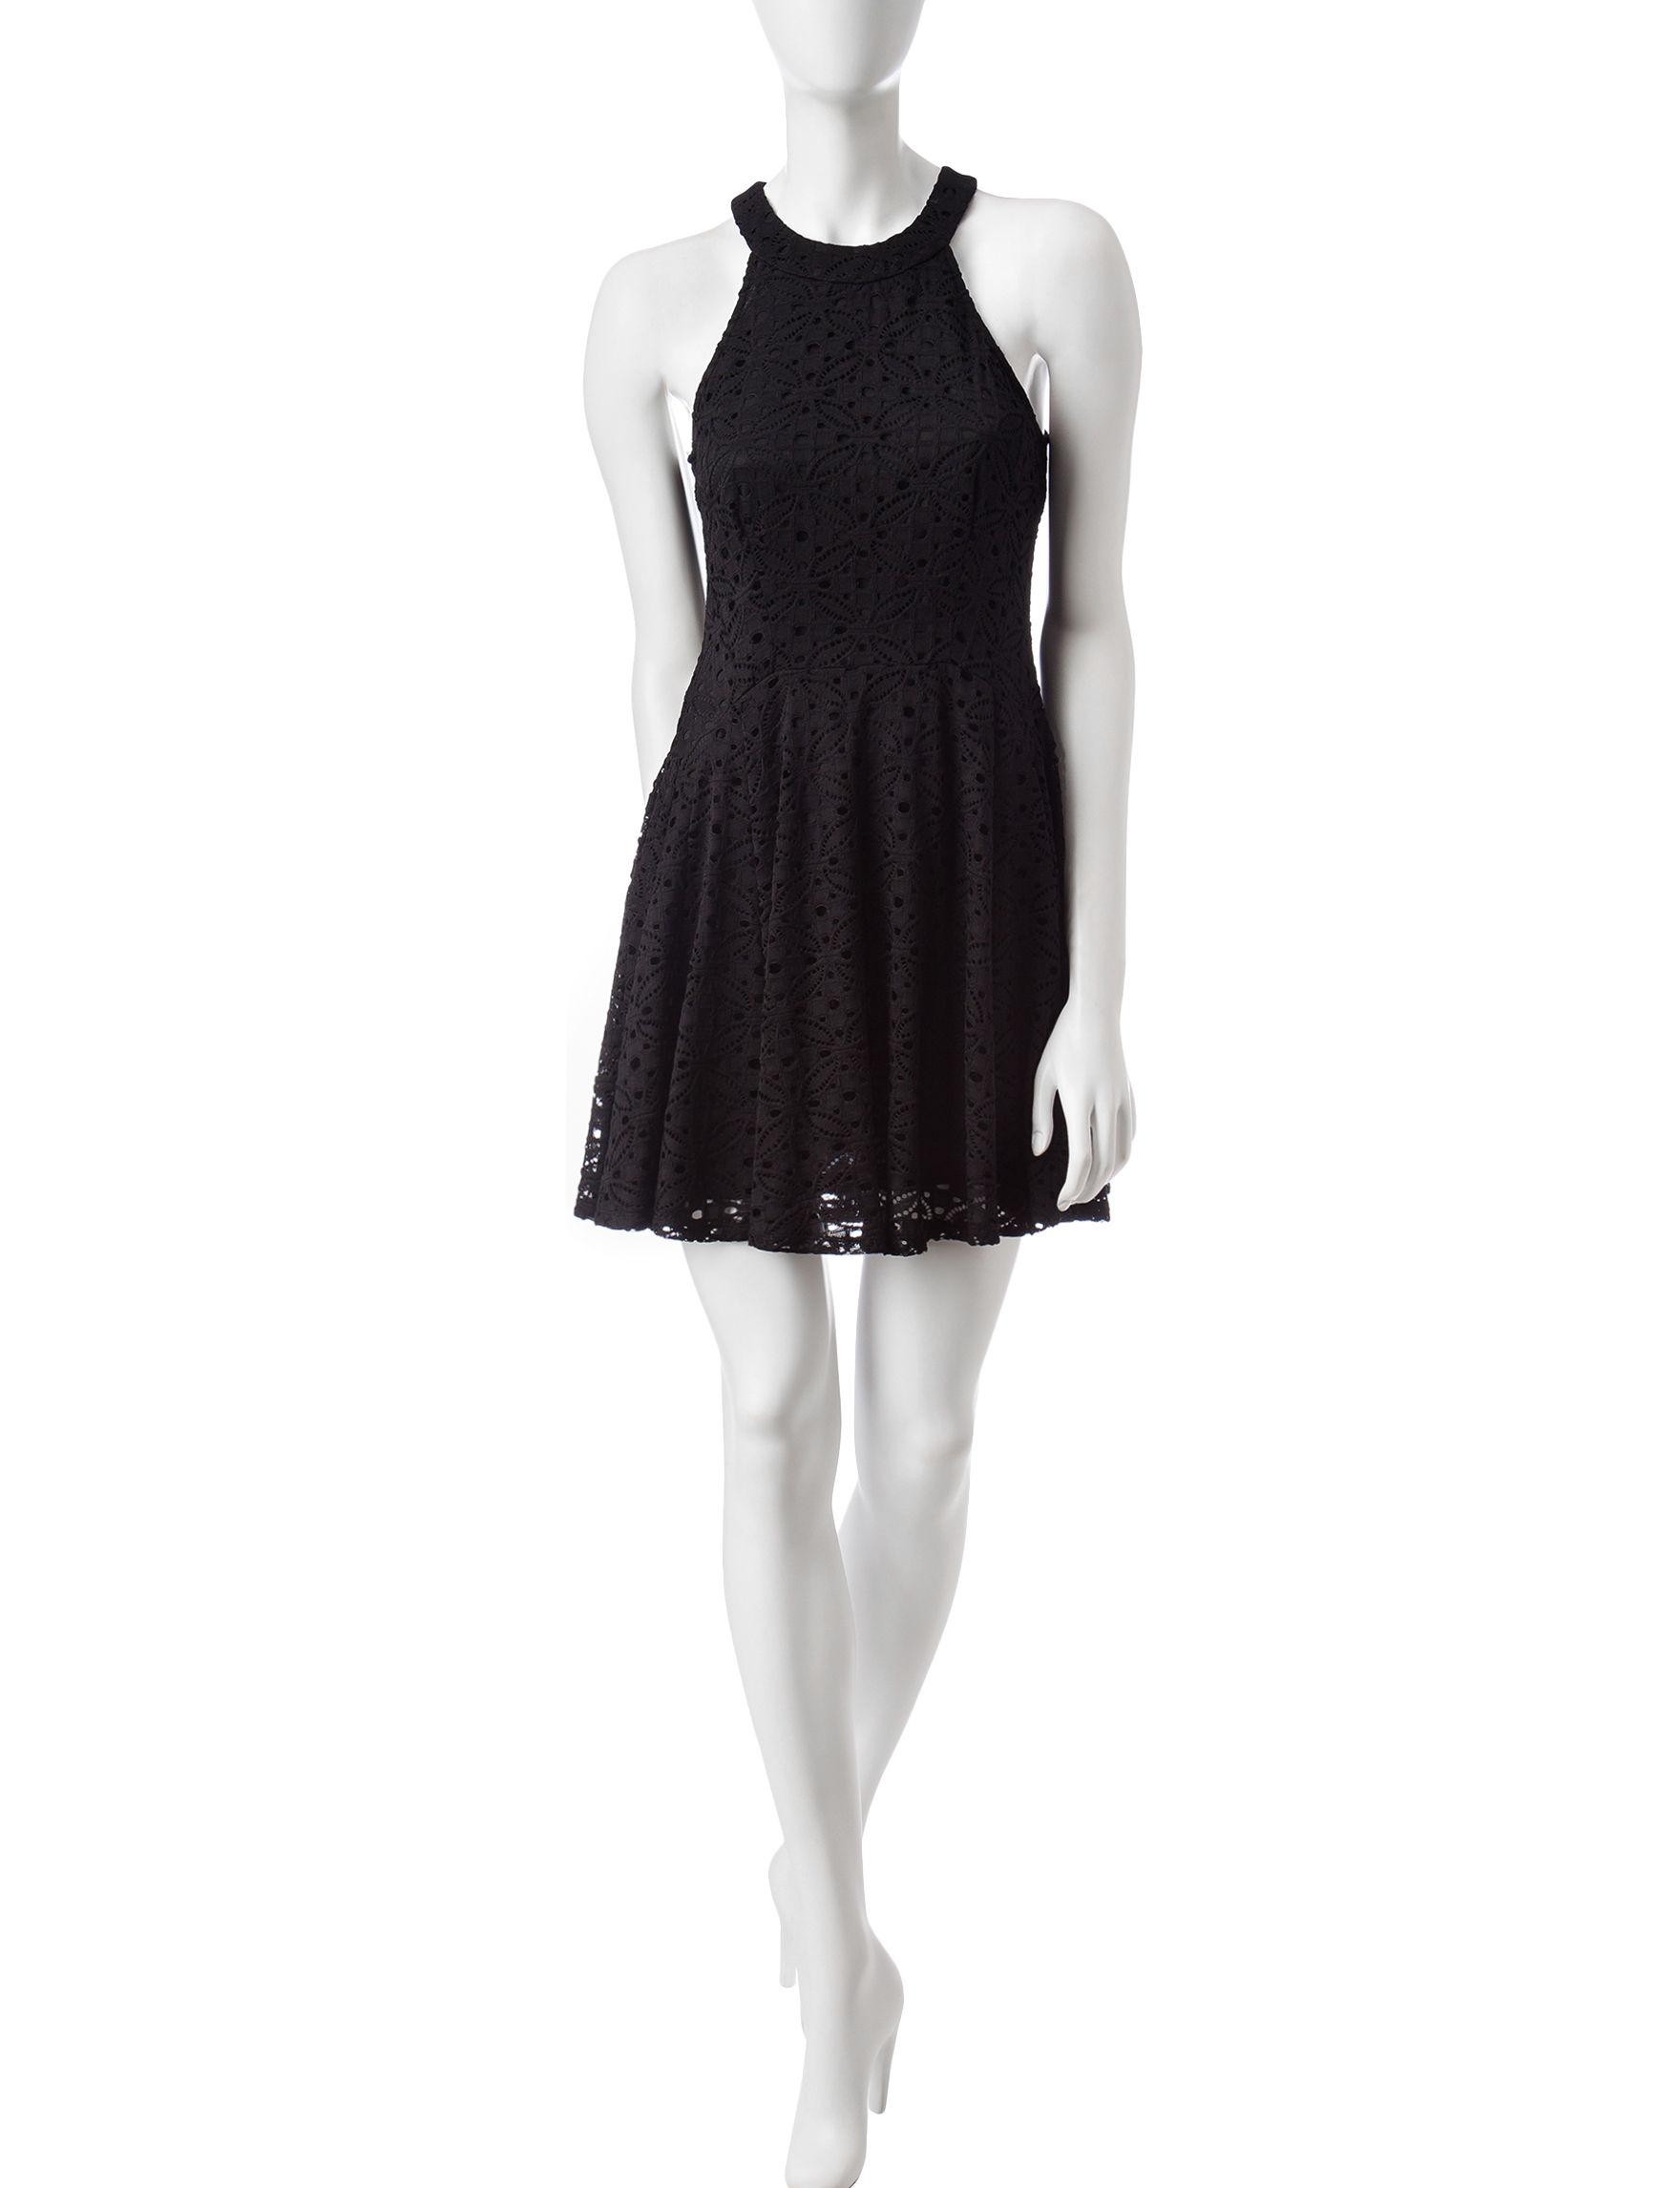 BeBop Black Everyday & Casual Fit & Flare Dresses